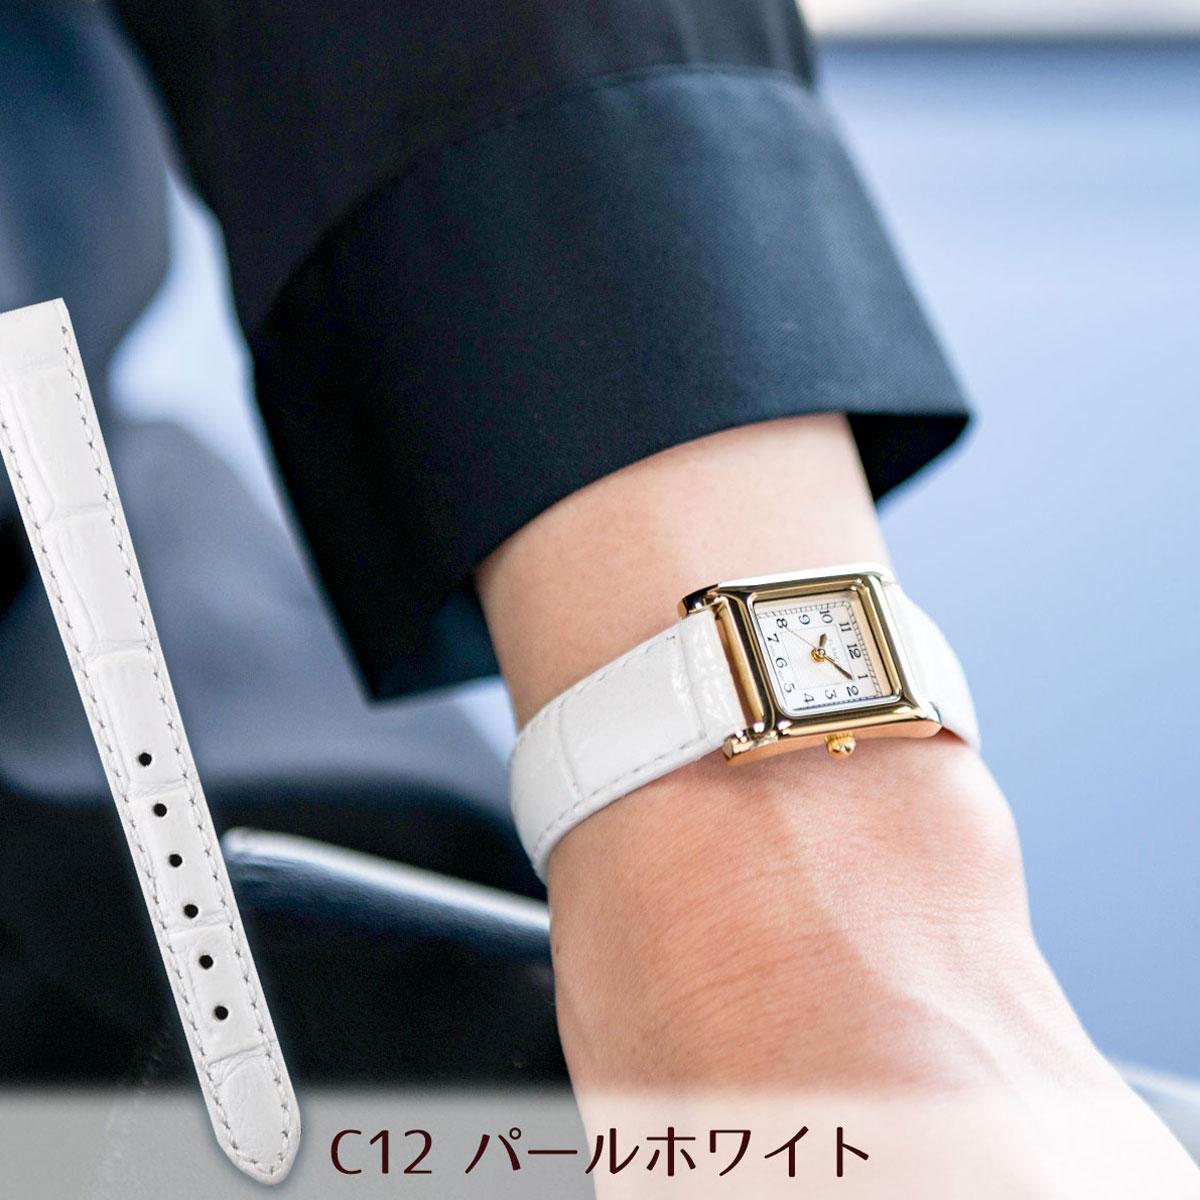 10mm 腕時計ベルト マニフィック 牛革クロコ型押し